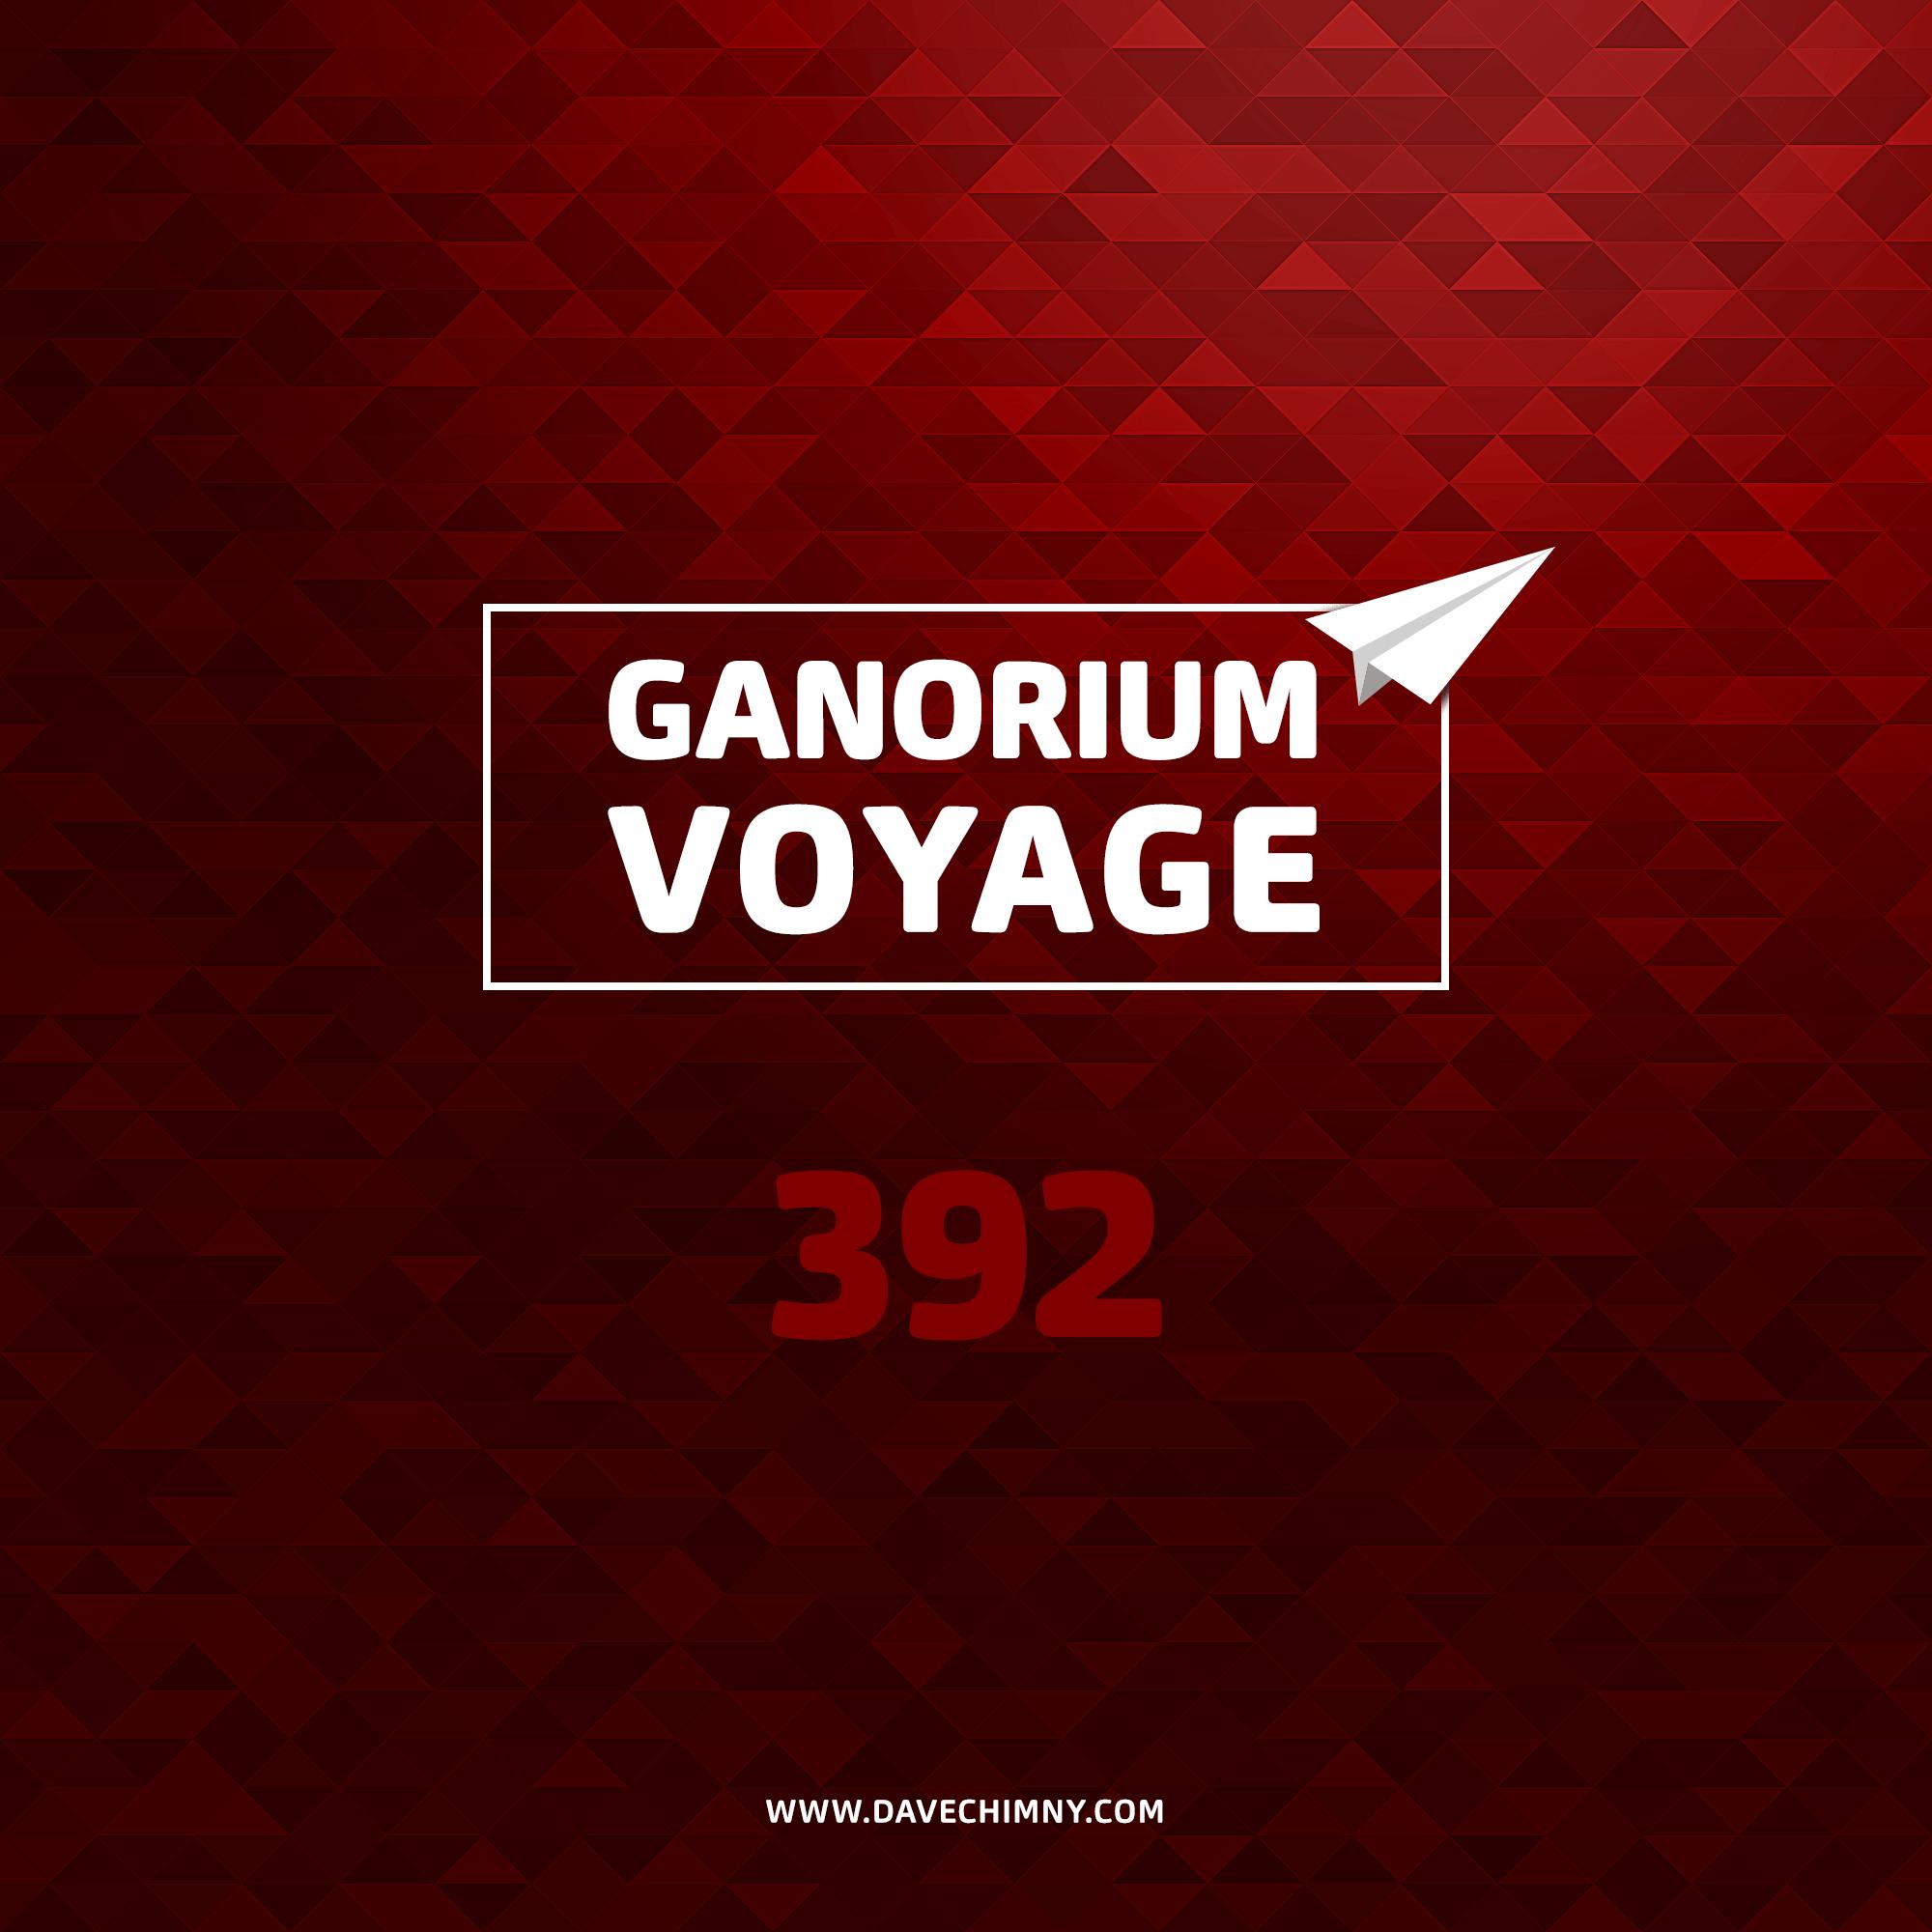 Dave Chimny – Ganorium Voyage 392